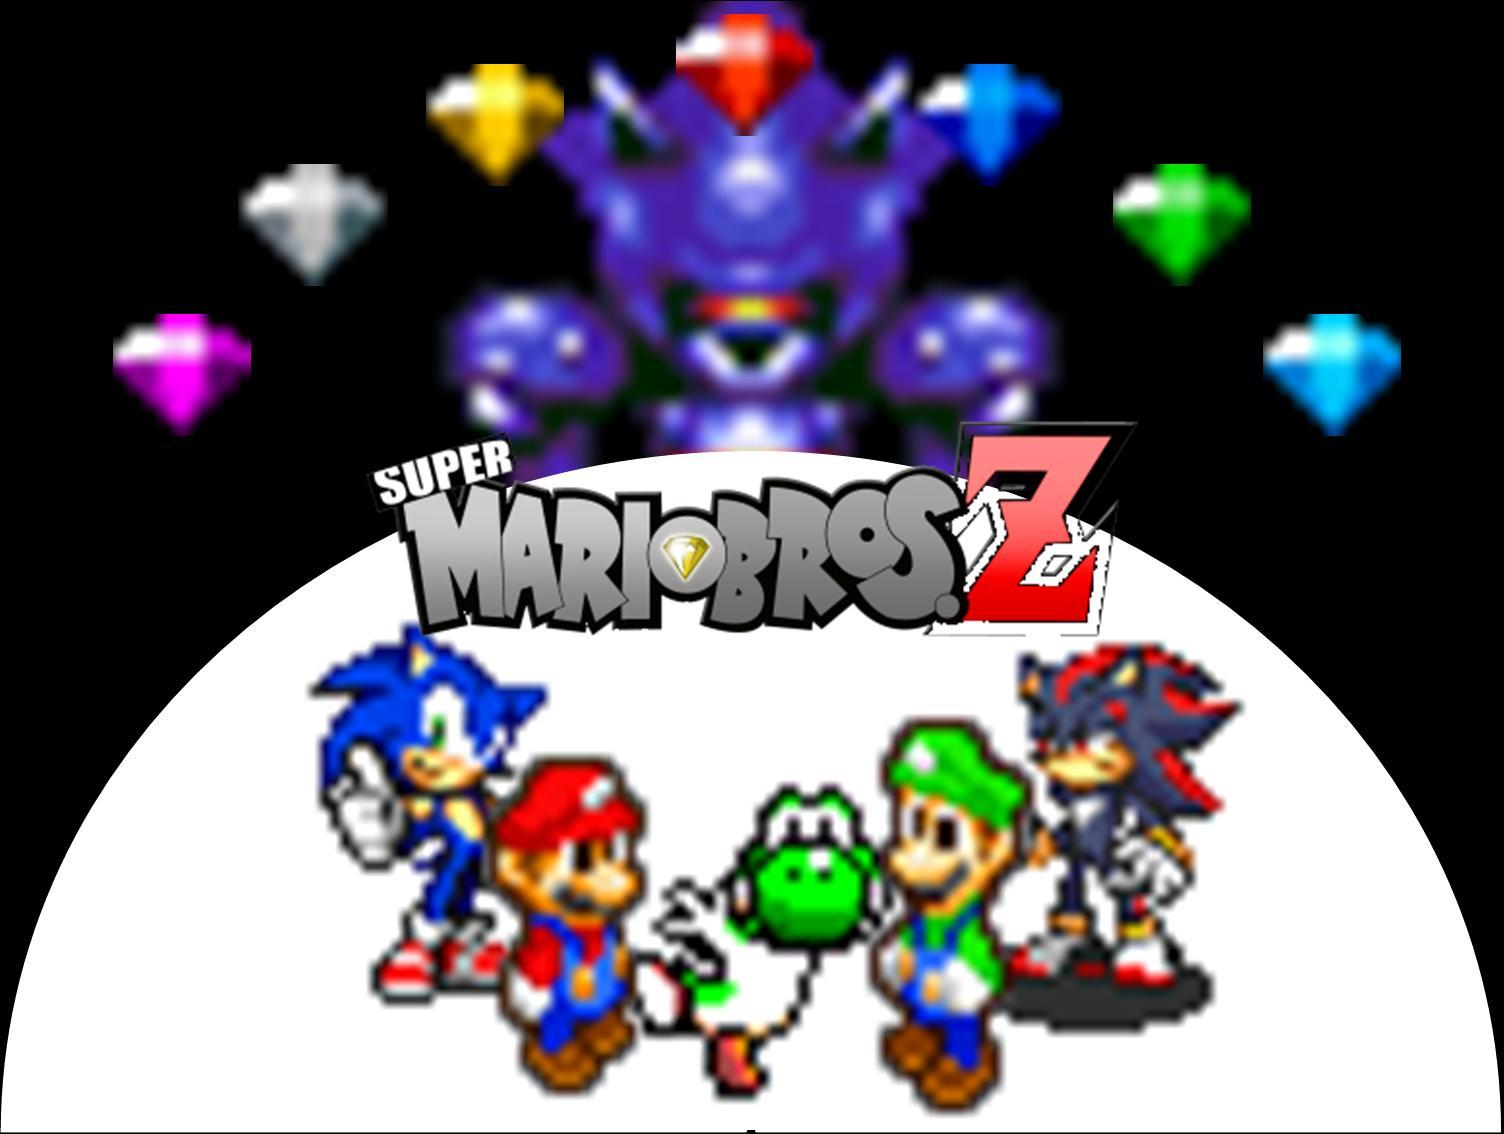 Mario Bros. Z